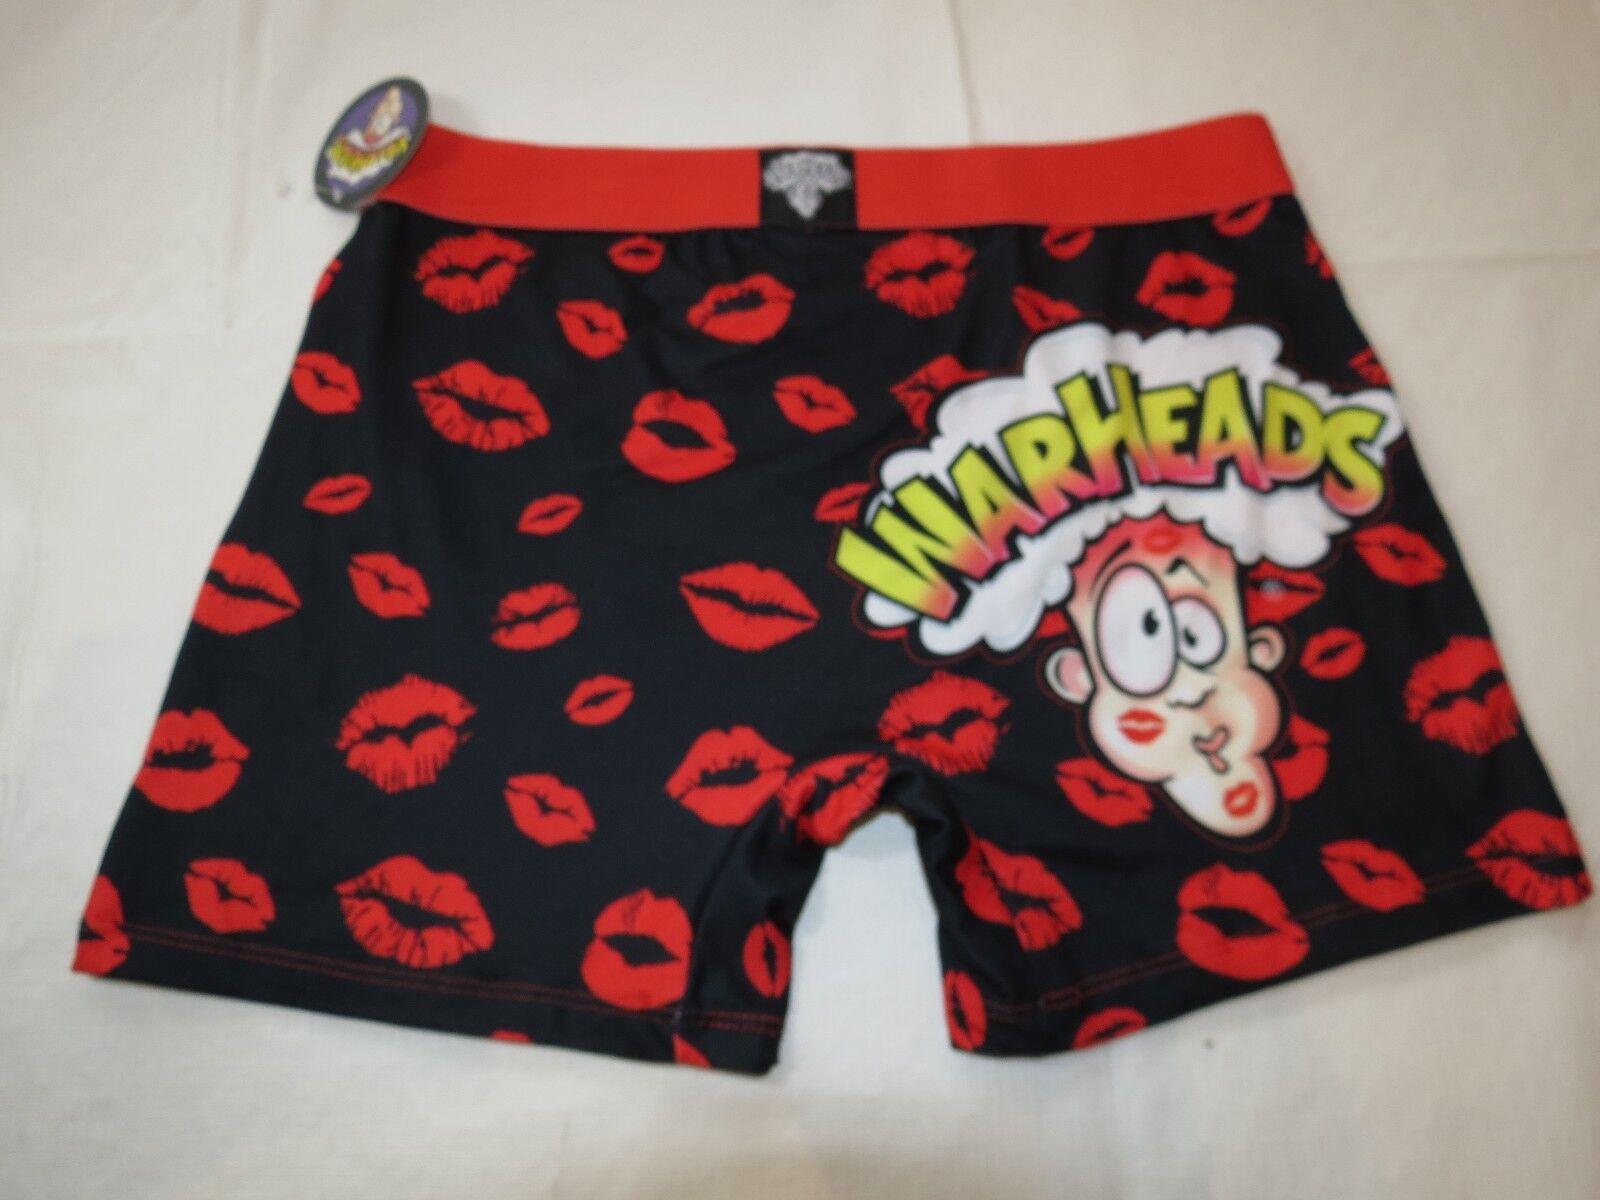 c39116e0292c Warheads Crazy Boxer Shorts Underwear Mens Lounge Large L ...